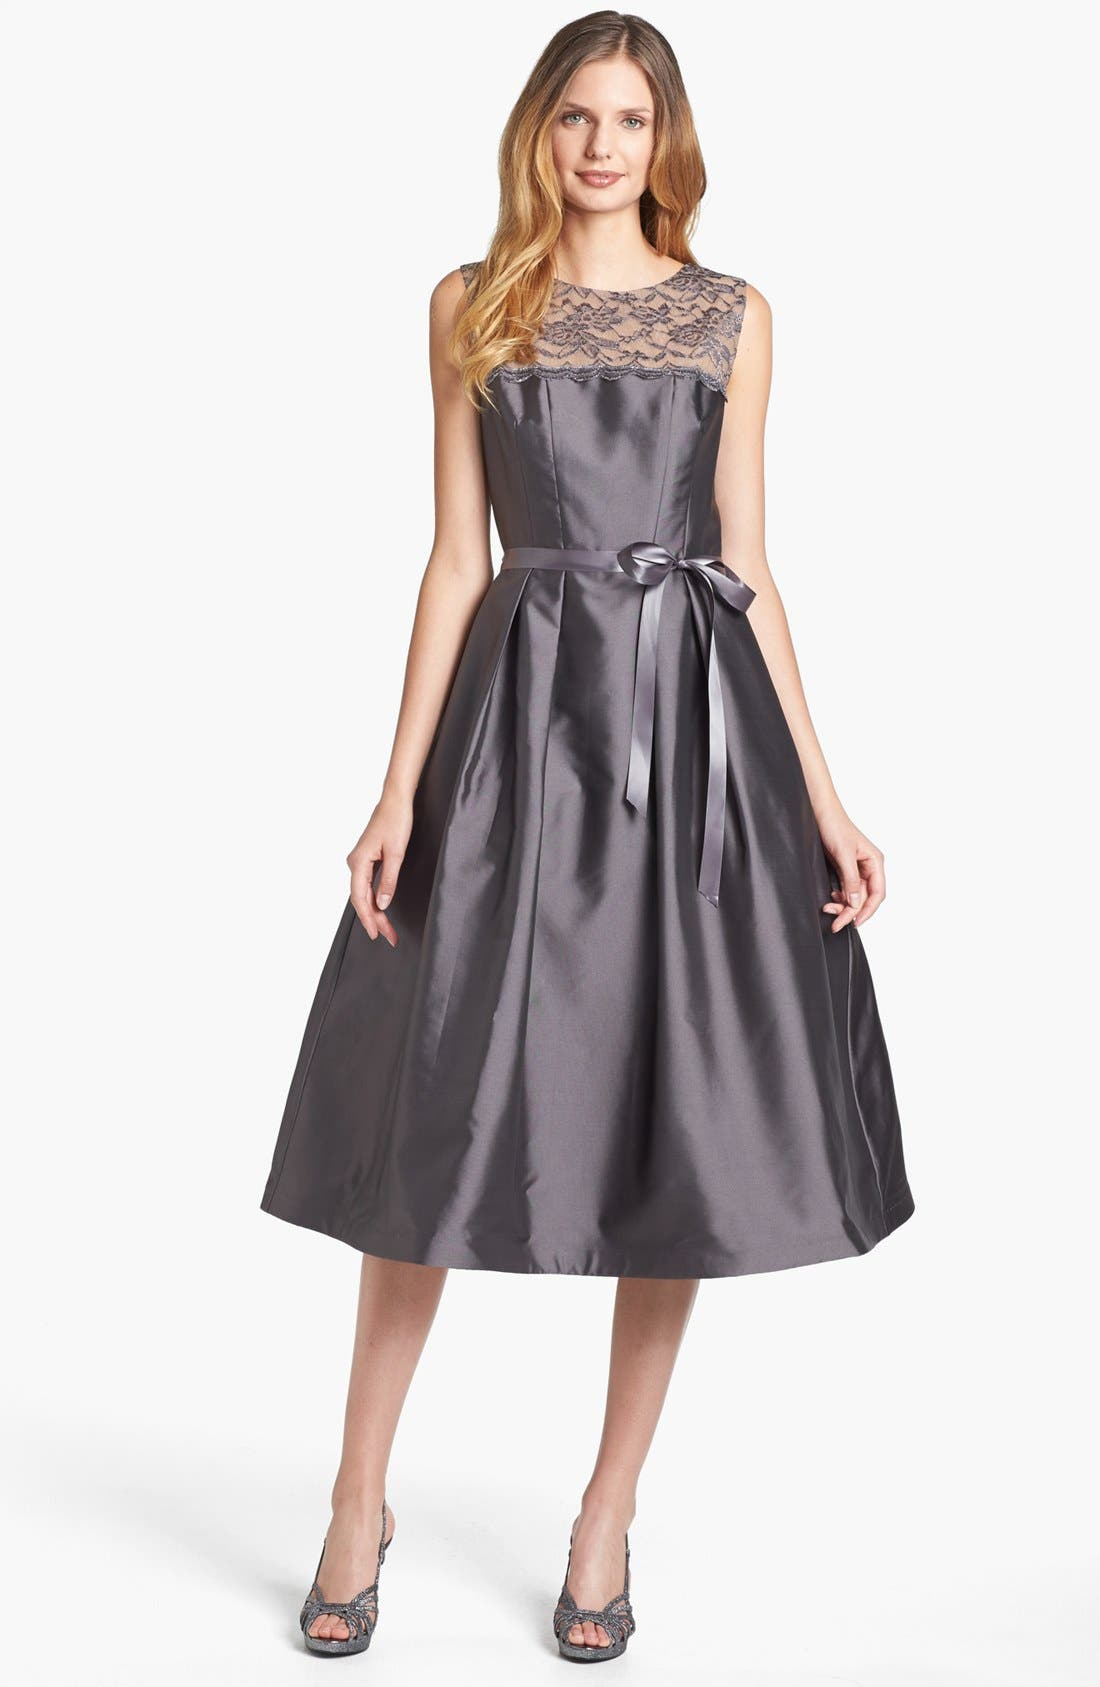 Main Image - Alex Evenings Illusion Yoke Satin Fit & Flare Dress